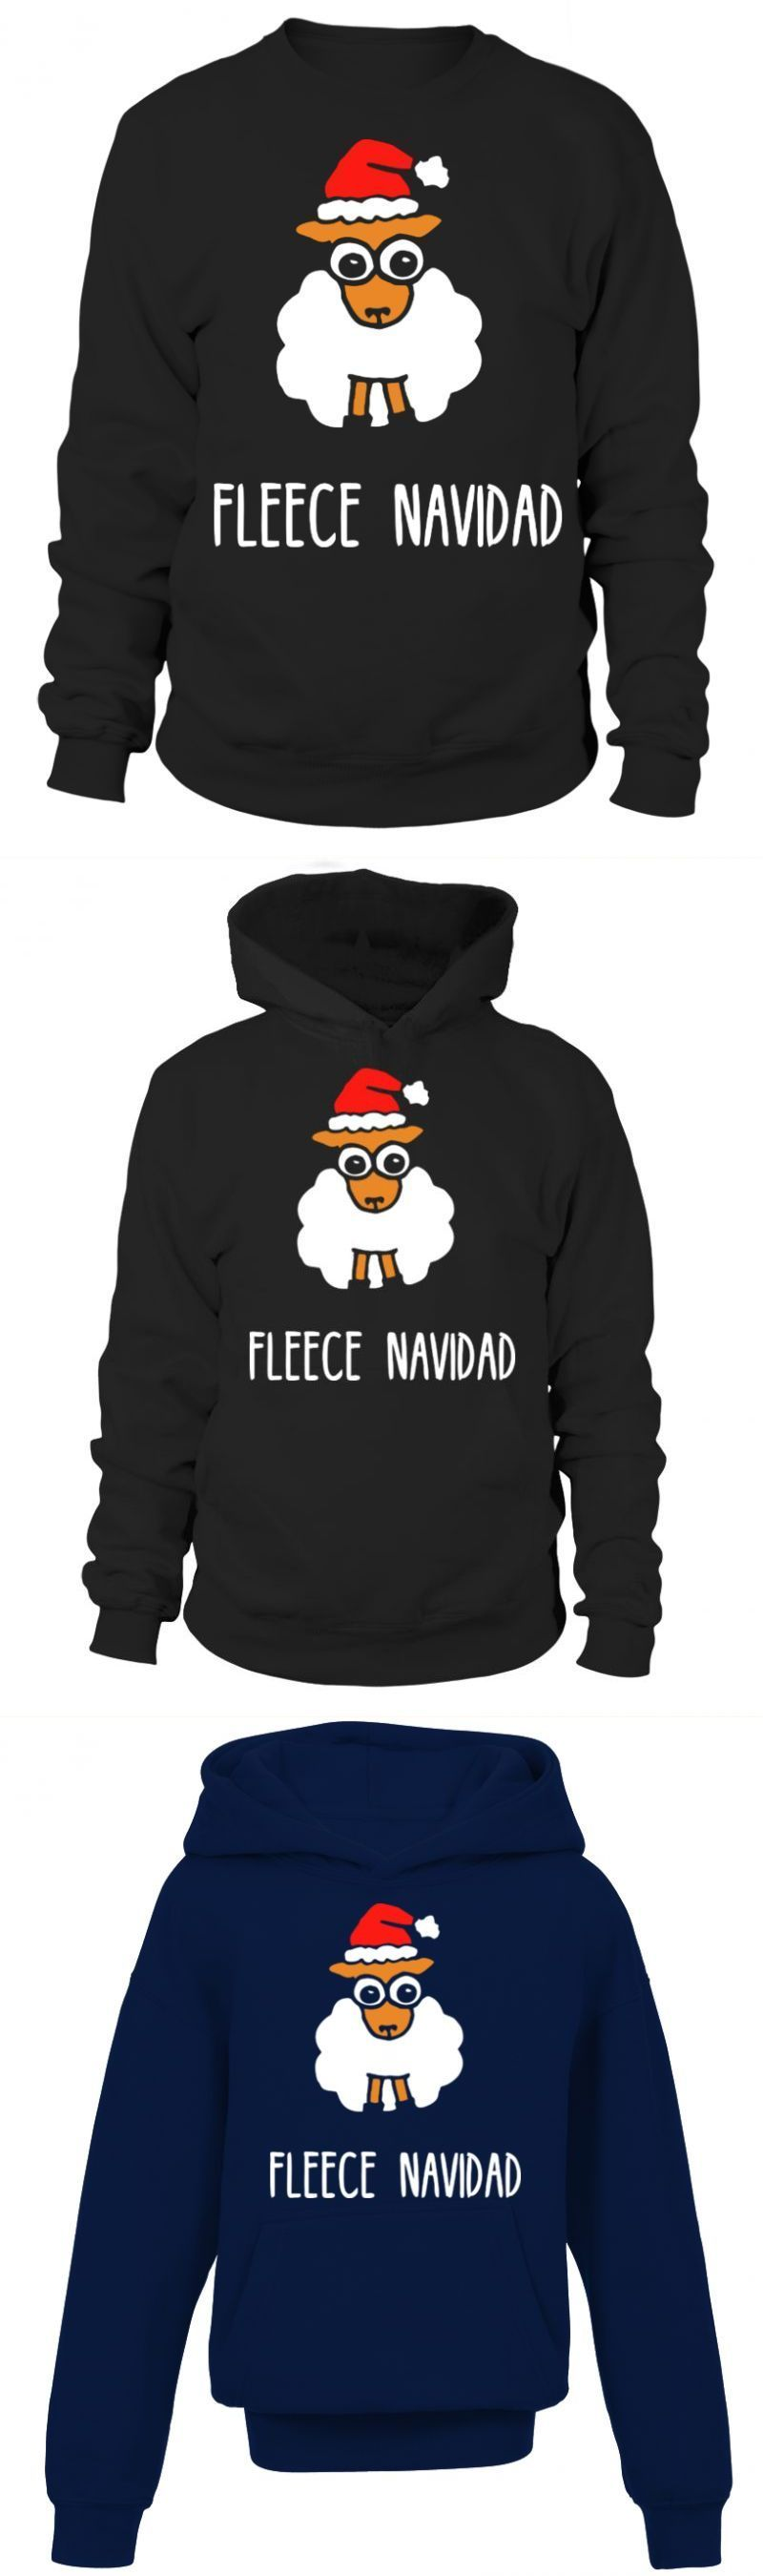 Uniseks Kersttrui.Wray Nephew T Shirt Kersttrui Fleece Navidad Aunt Nephew T Shirt